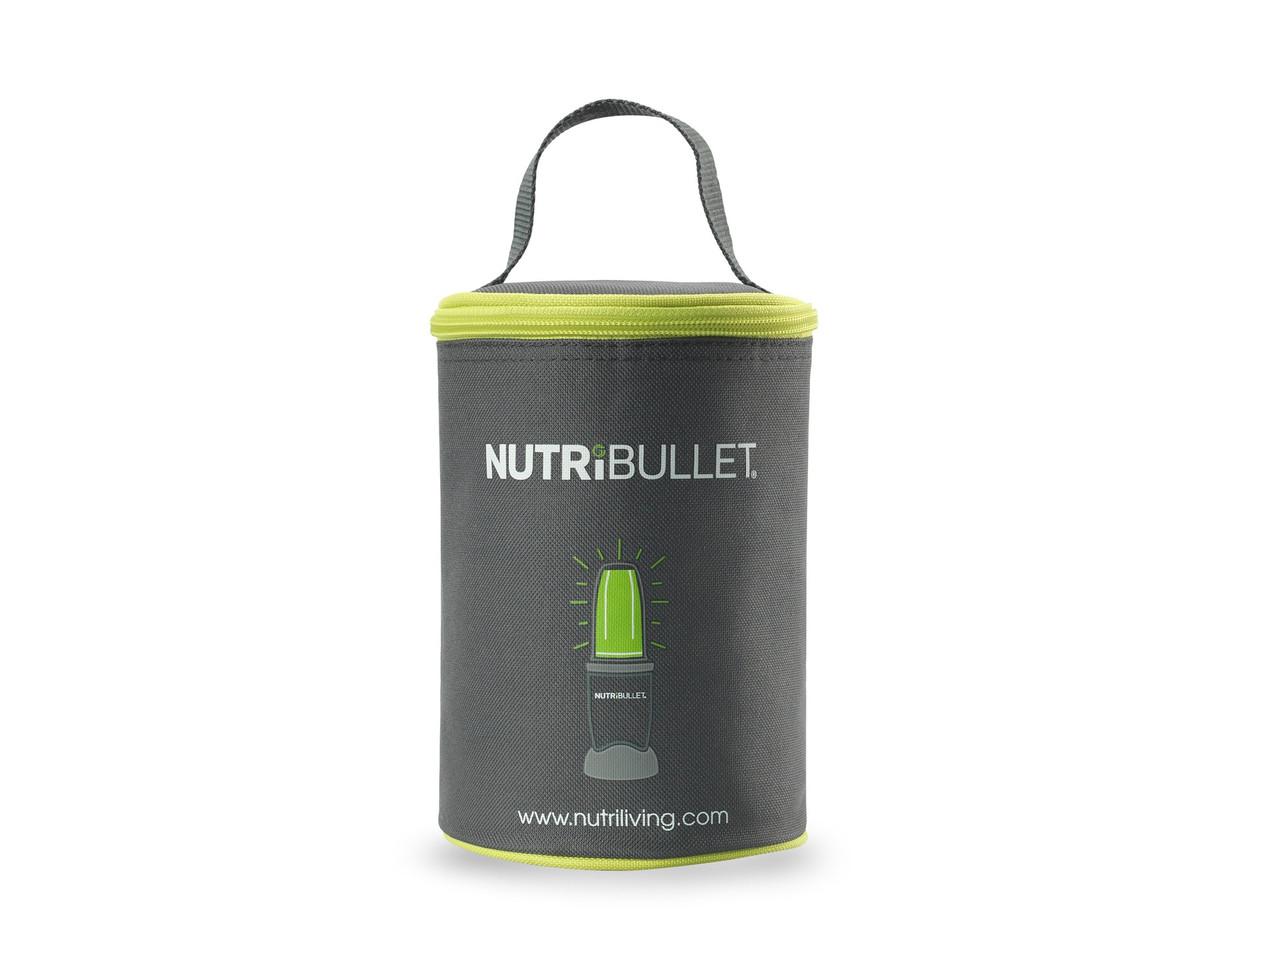 Портативная термосумка NutriBullet Delimano